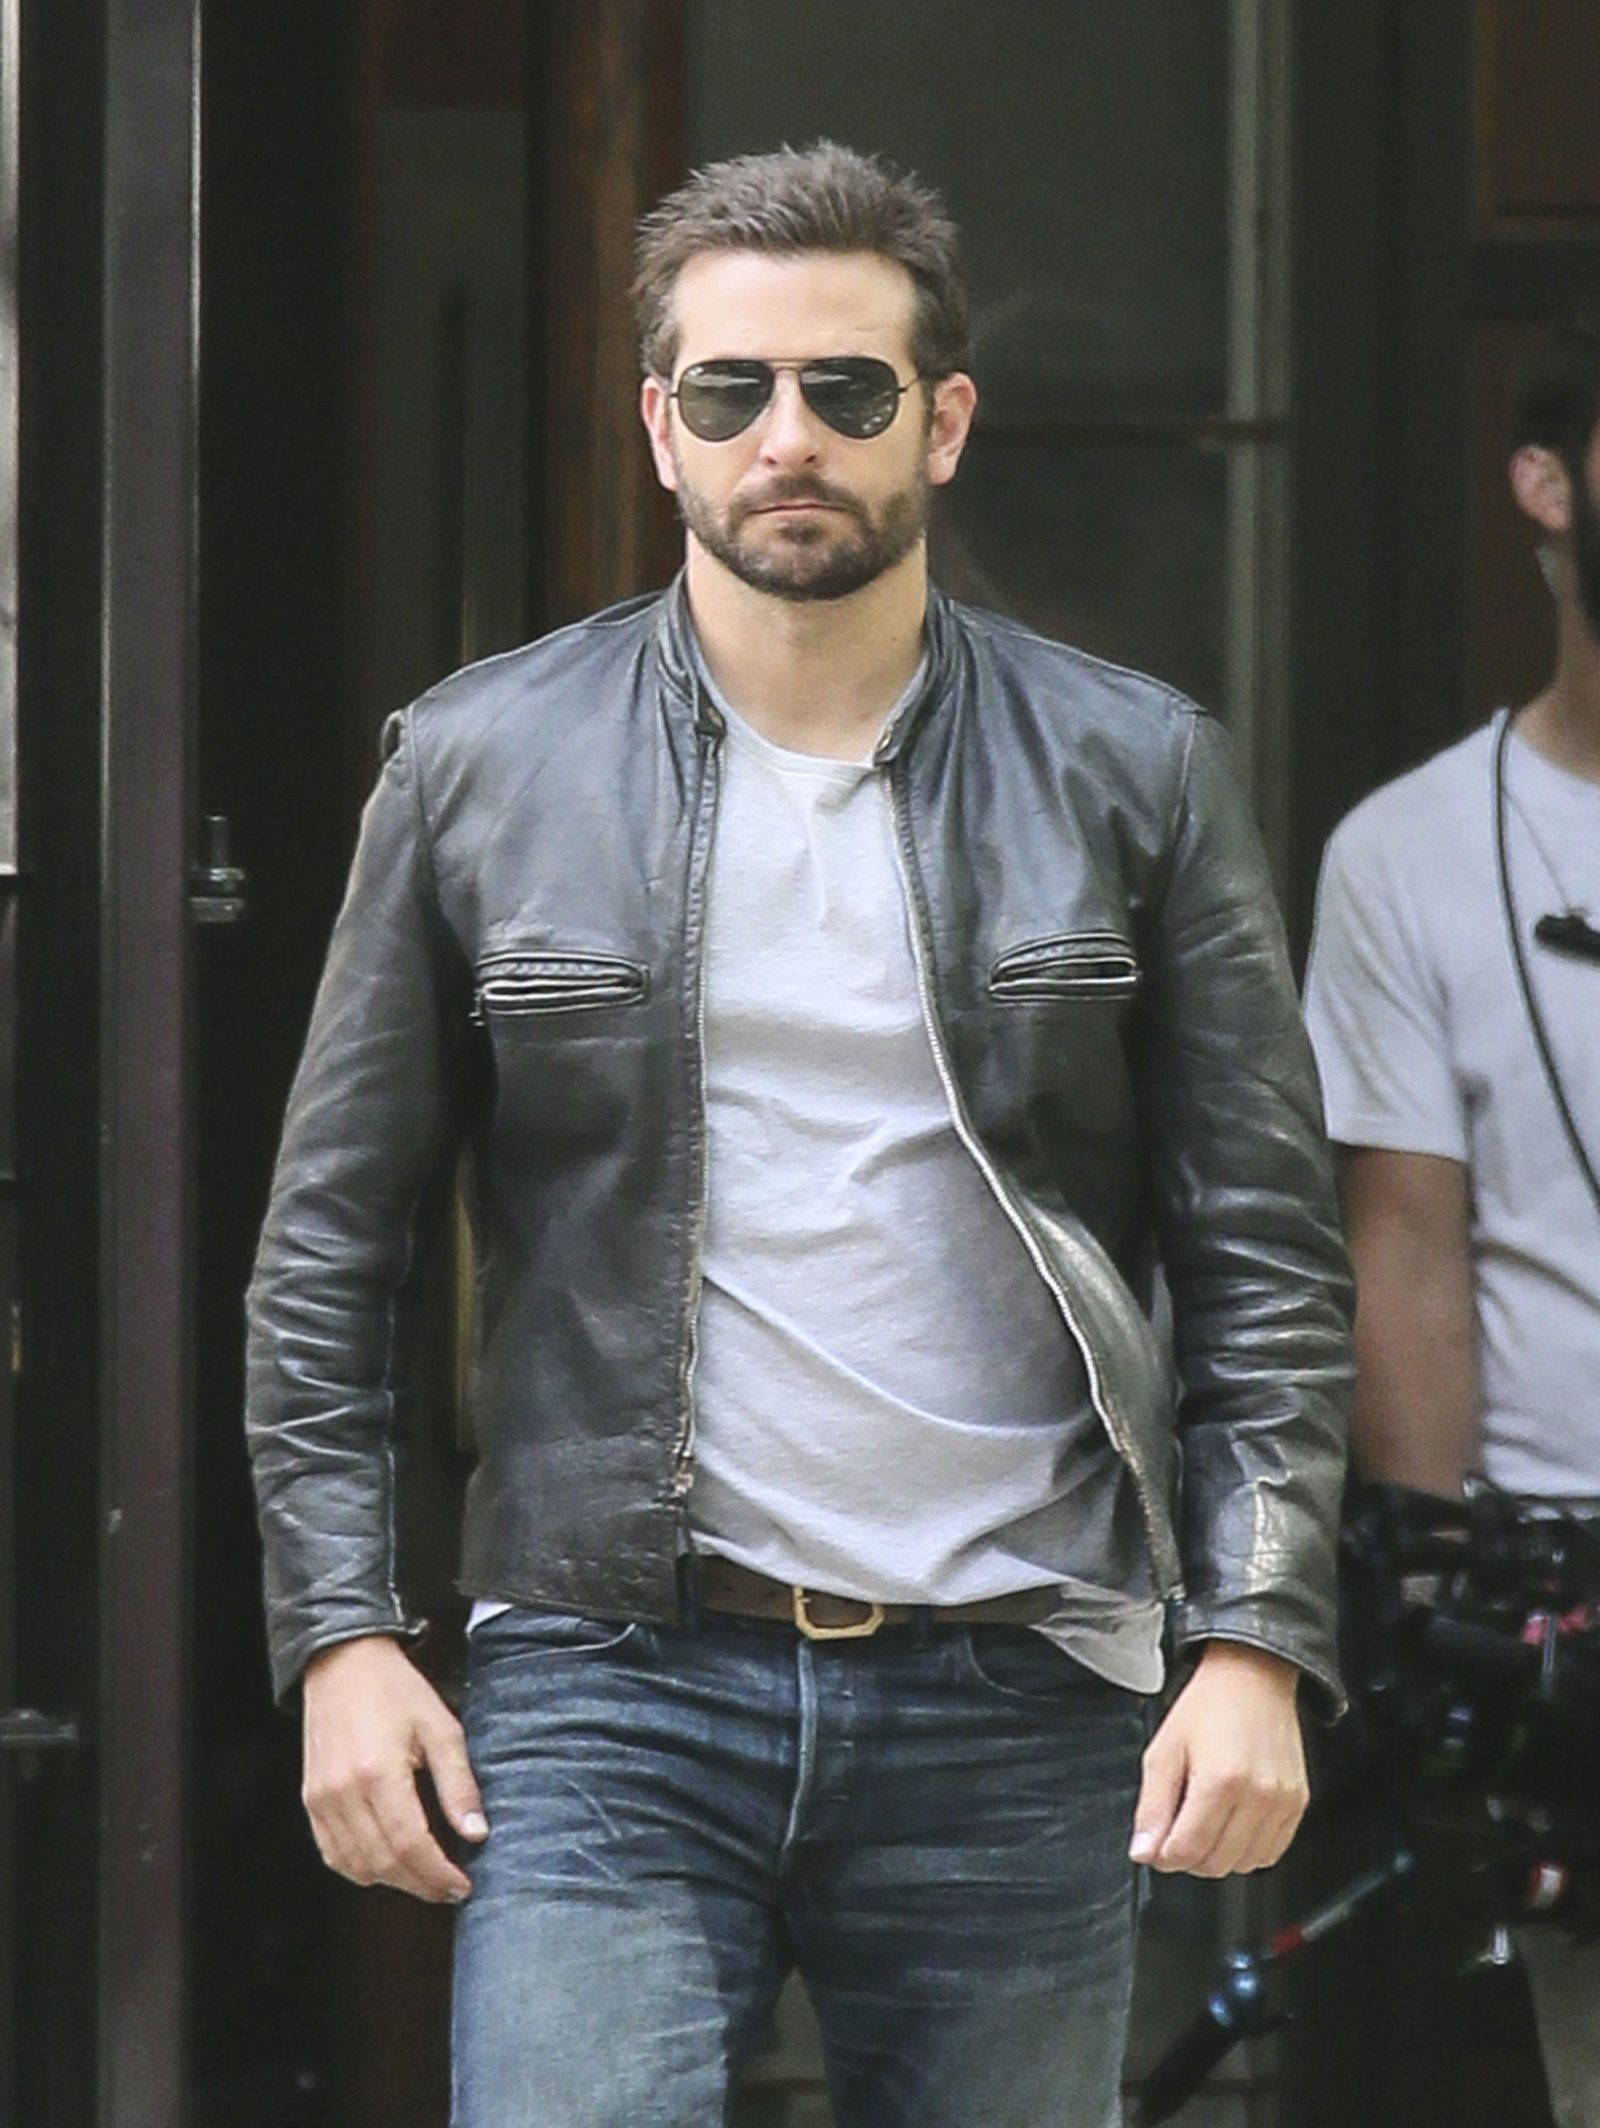 Bradley Cooper seen in in central London as he films scenes for Adam Jones. SplashNews -Cosmopolitan.com